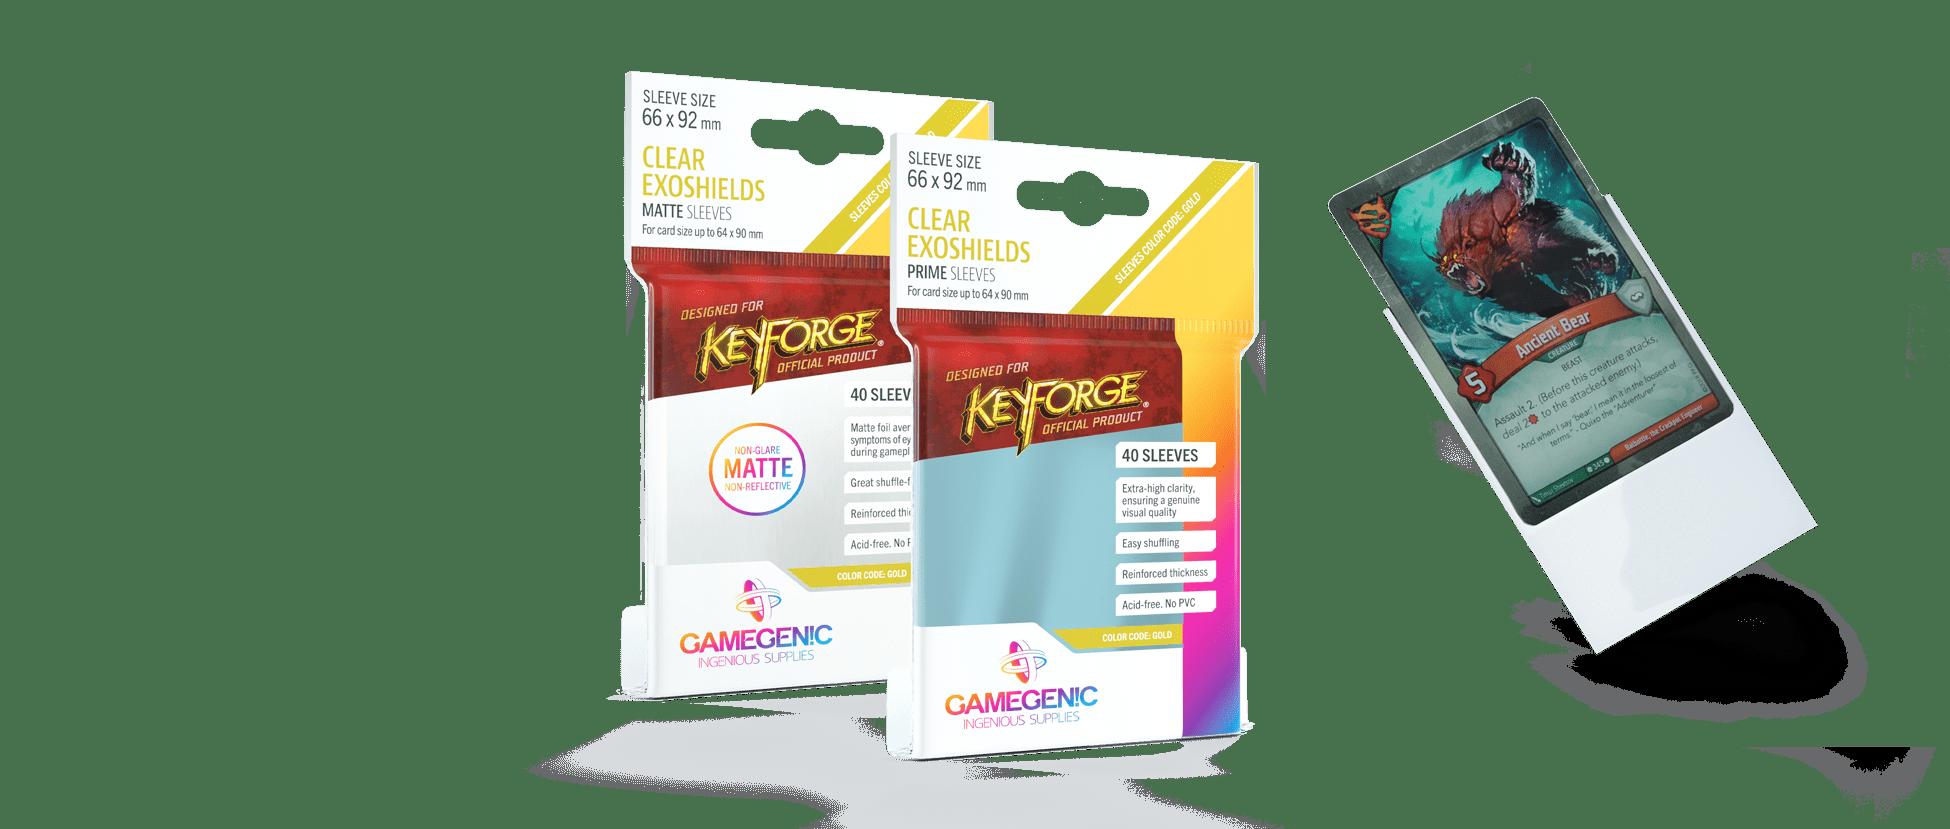 KeyForge CLEAR EXOSHIELDS